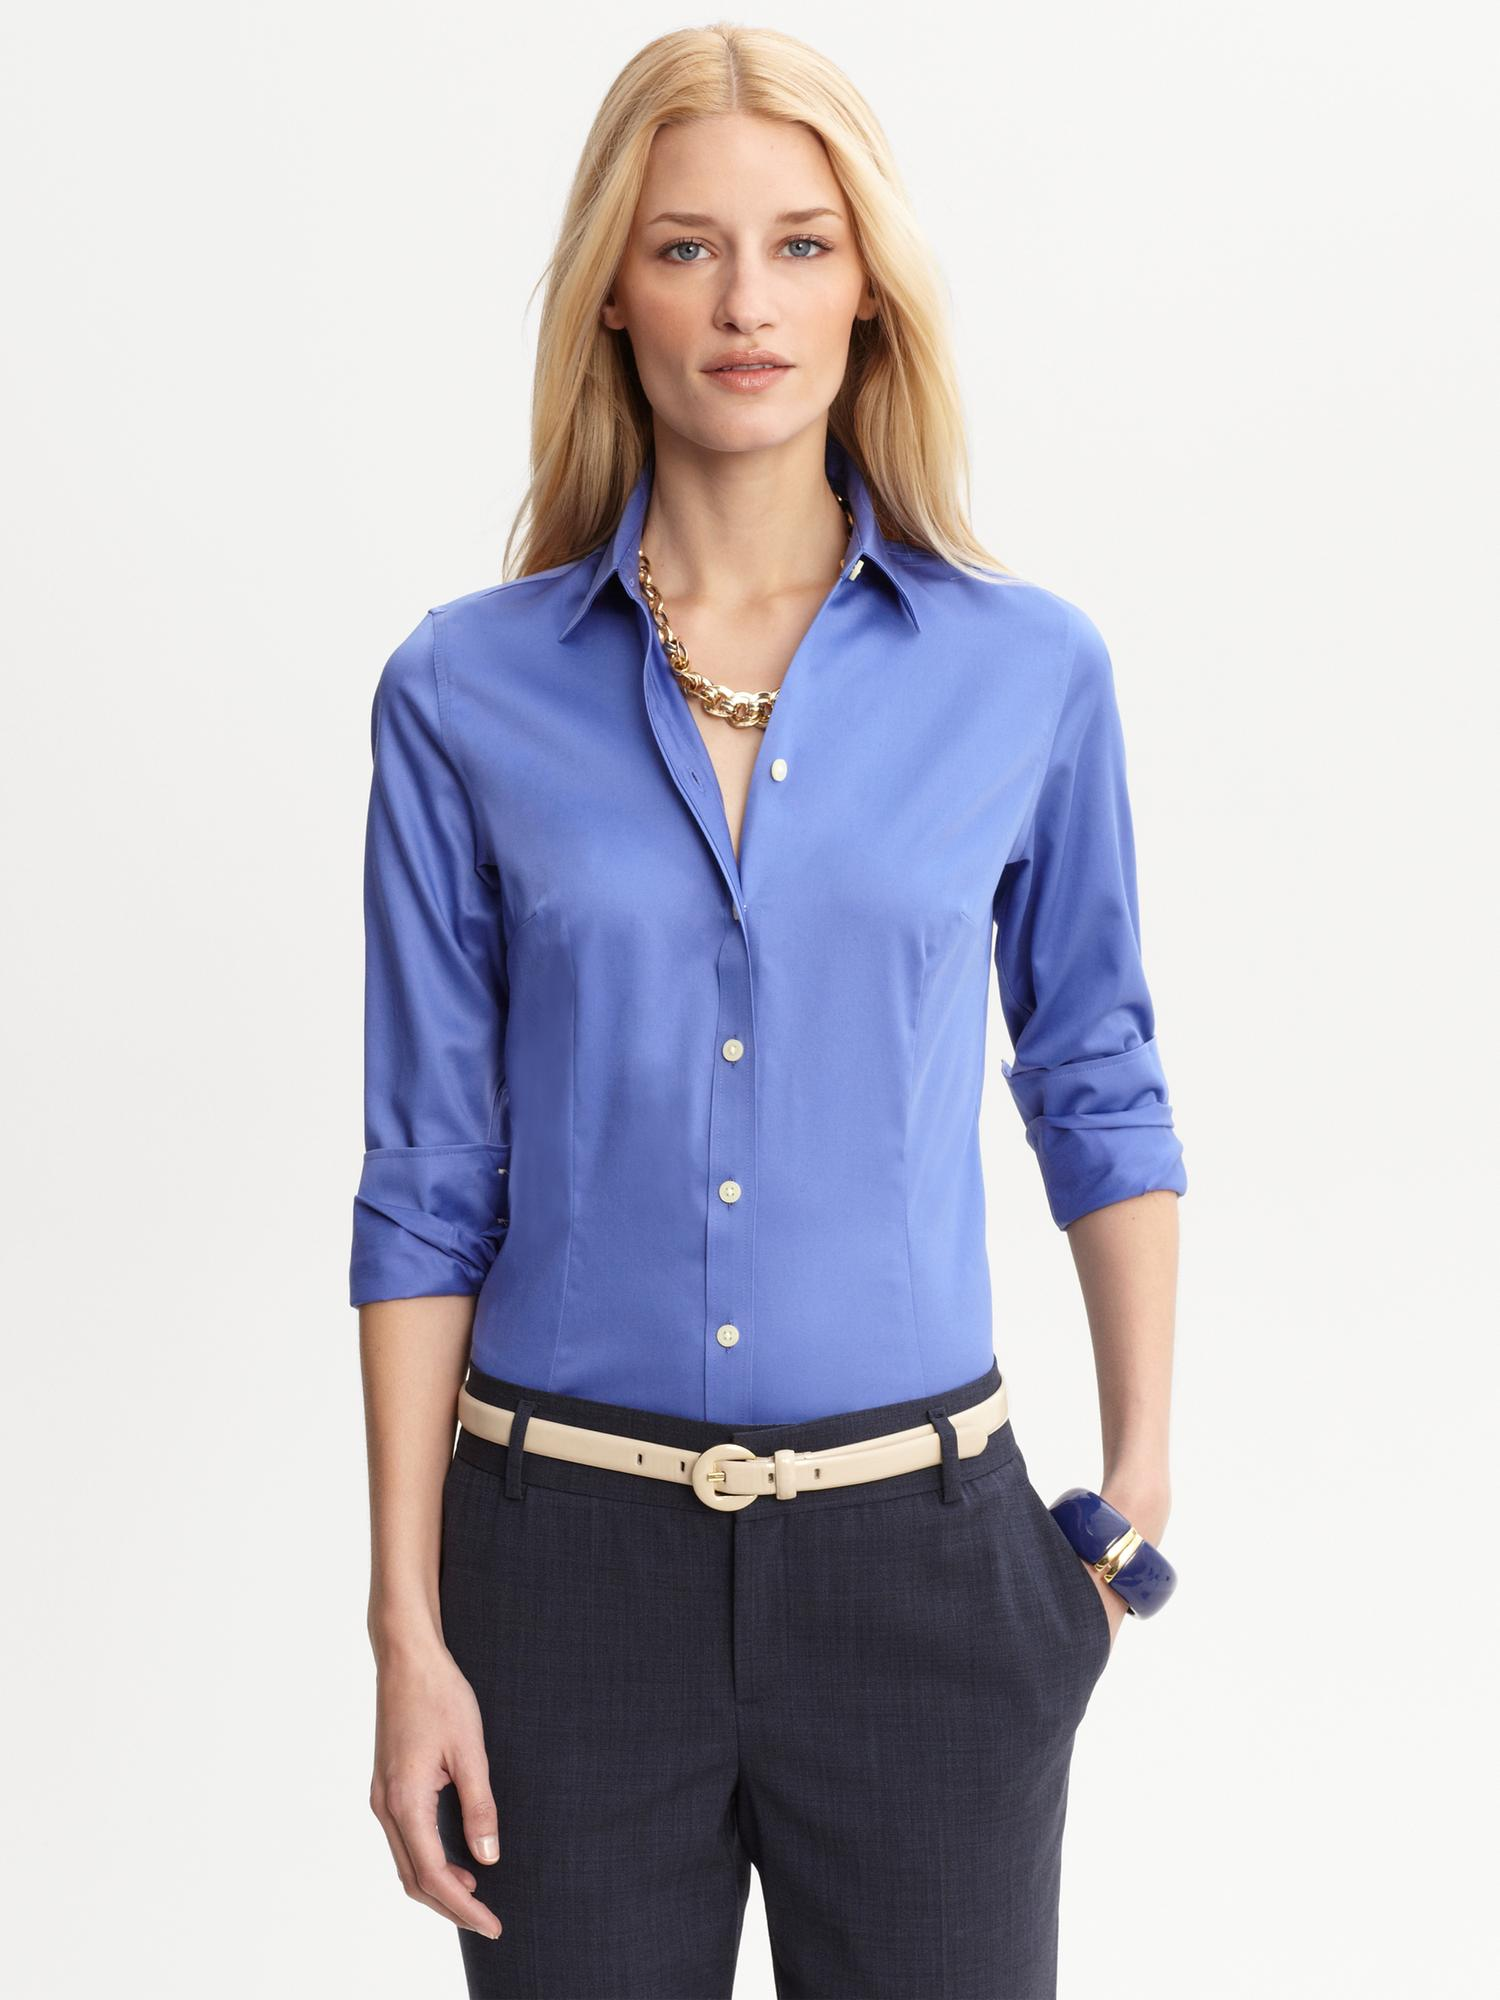 3989cef8625 Lyst - Banana Republic Tailored Non Iron Sateen Shirt in Blue